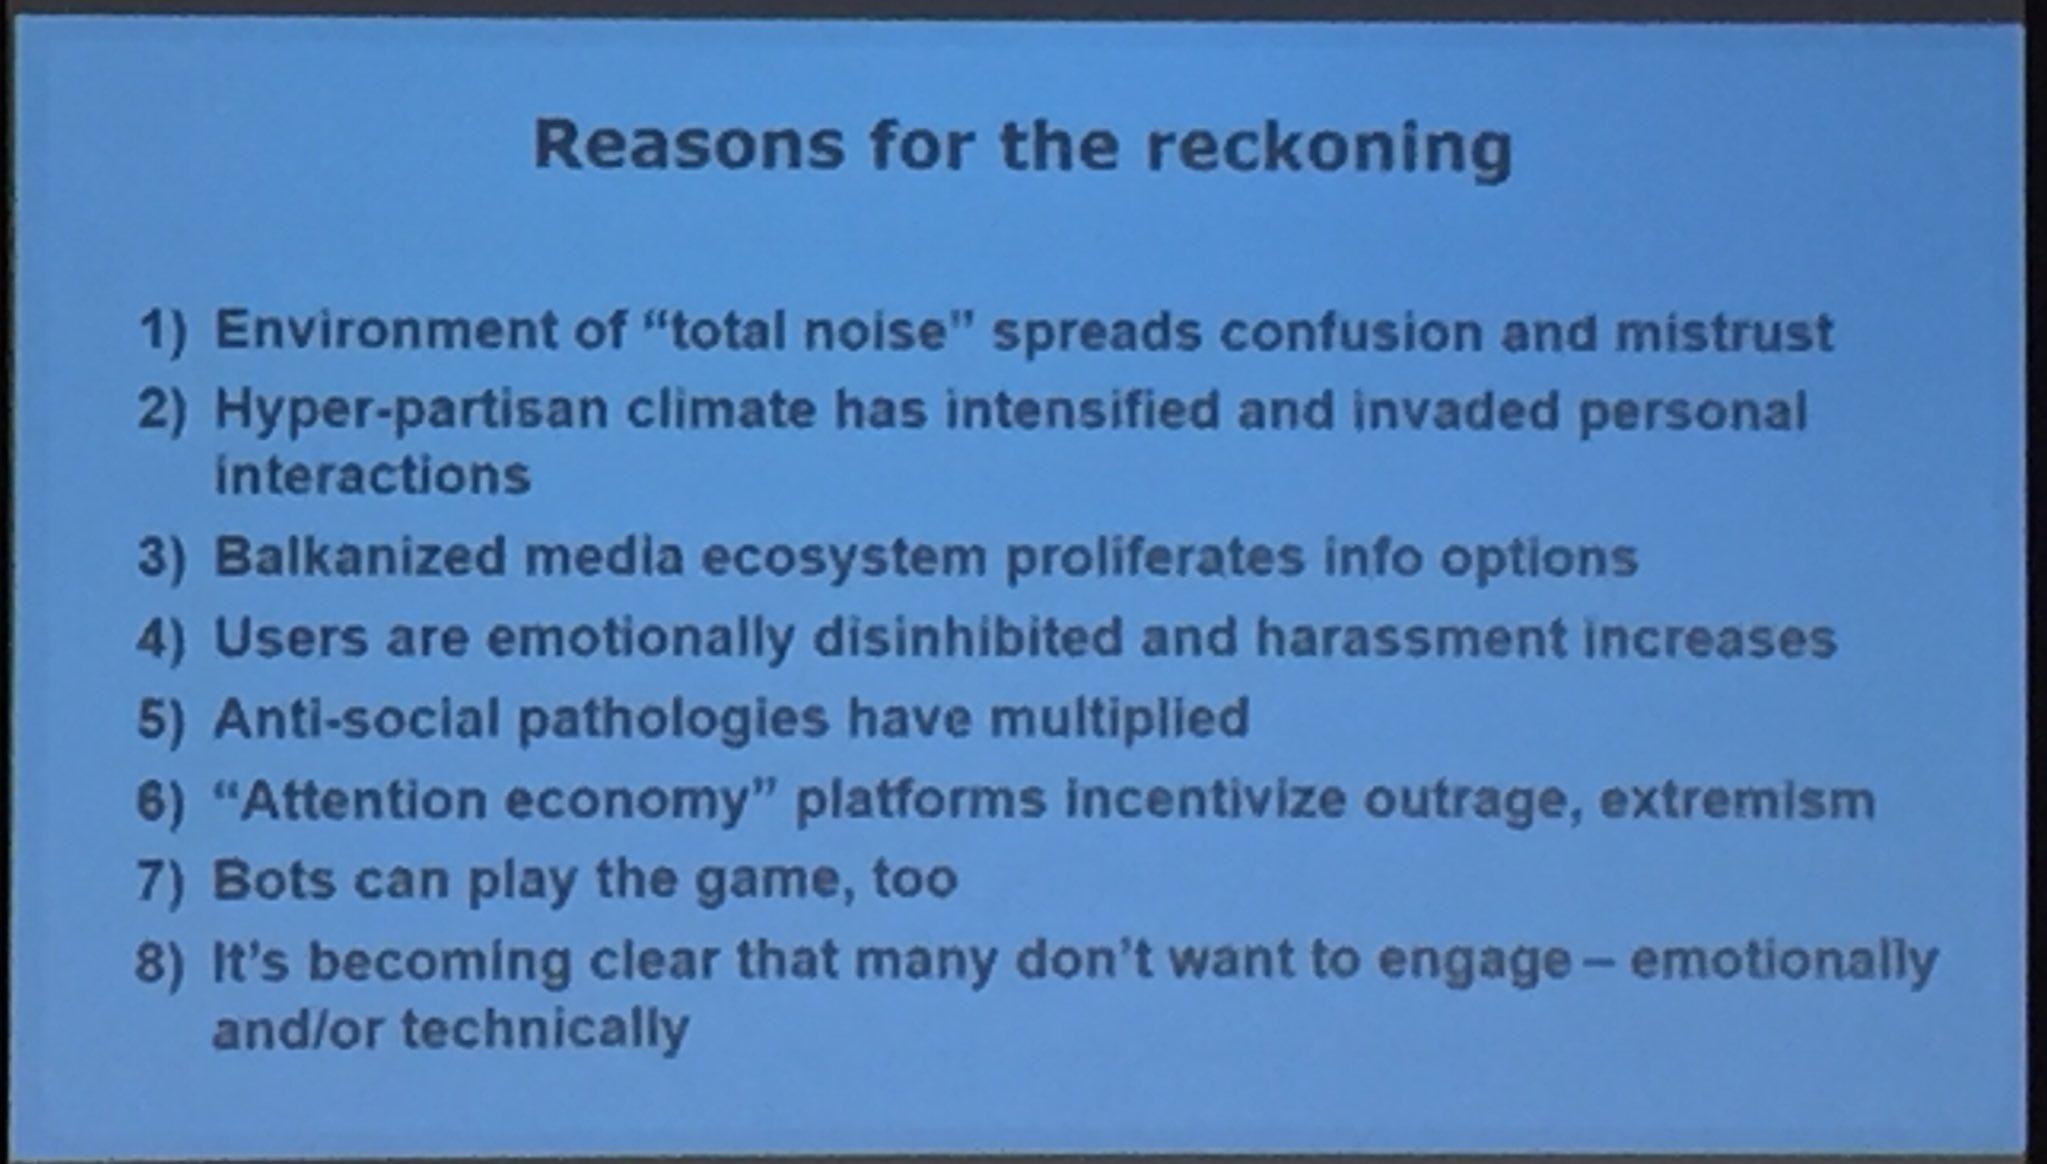 @lrainie: Reasons for the Reckoning of Social Media #SMSociety https://t.co/pq3xlvvTgK